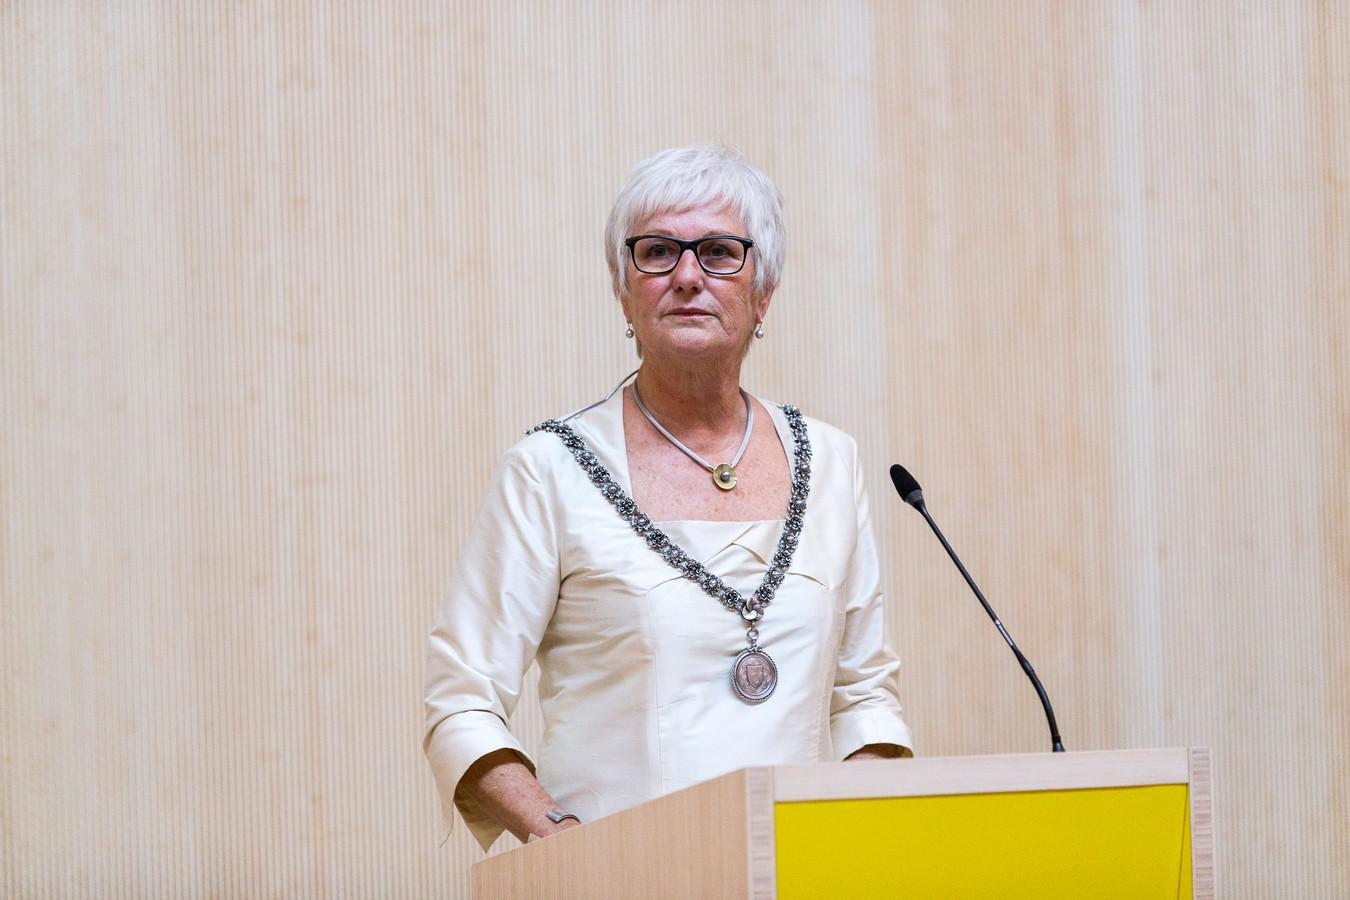 Aaltje Emmens-Knol als (waarnemend) burgemeester van Bloemendaal in 2015.